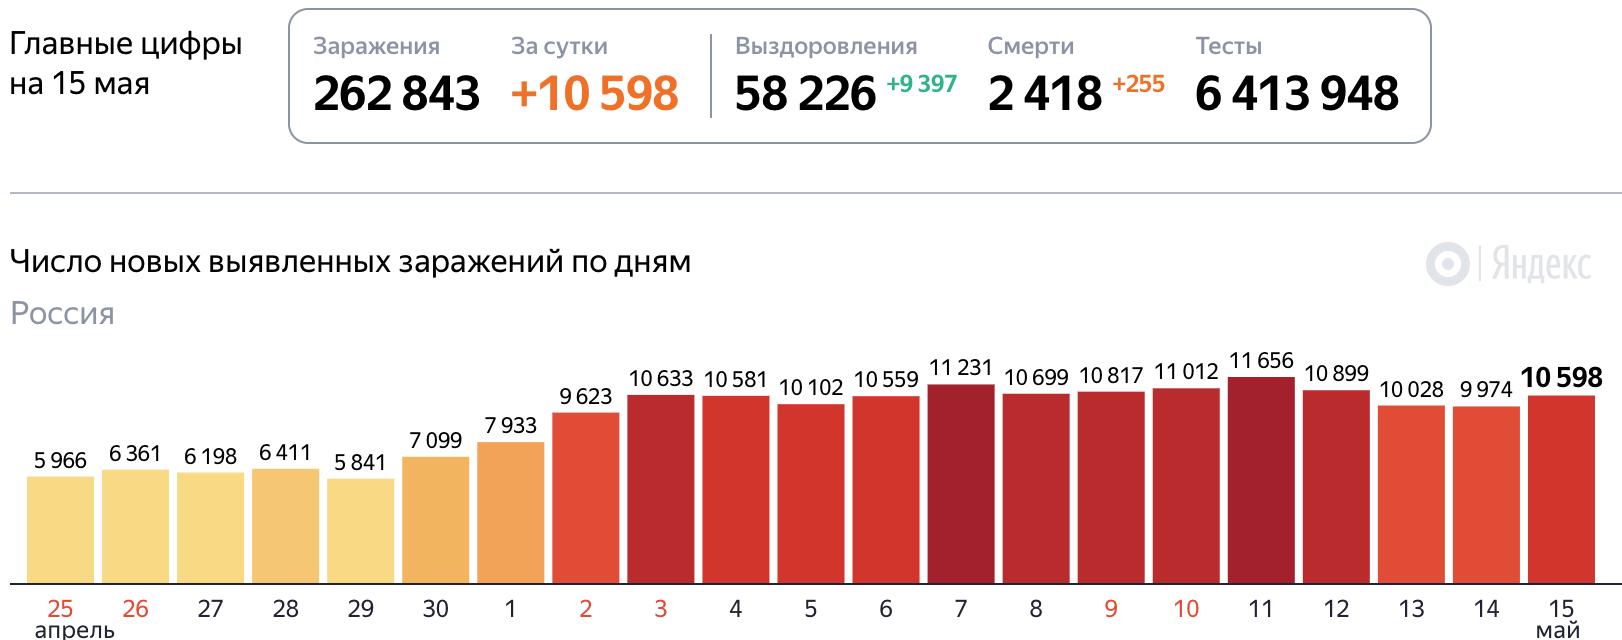 Коронавирус статистика на 15 мая 2020 года в России